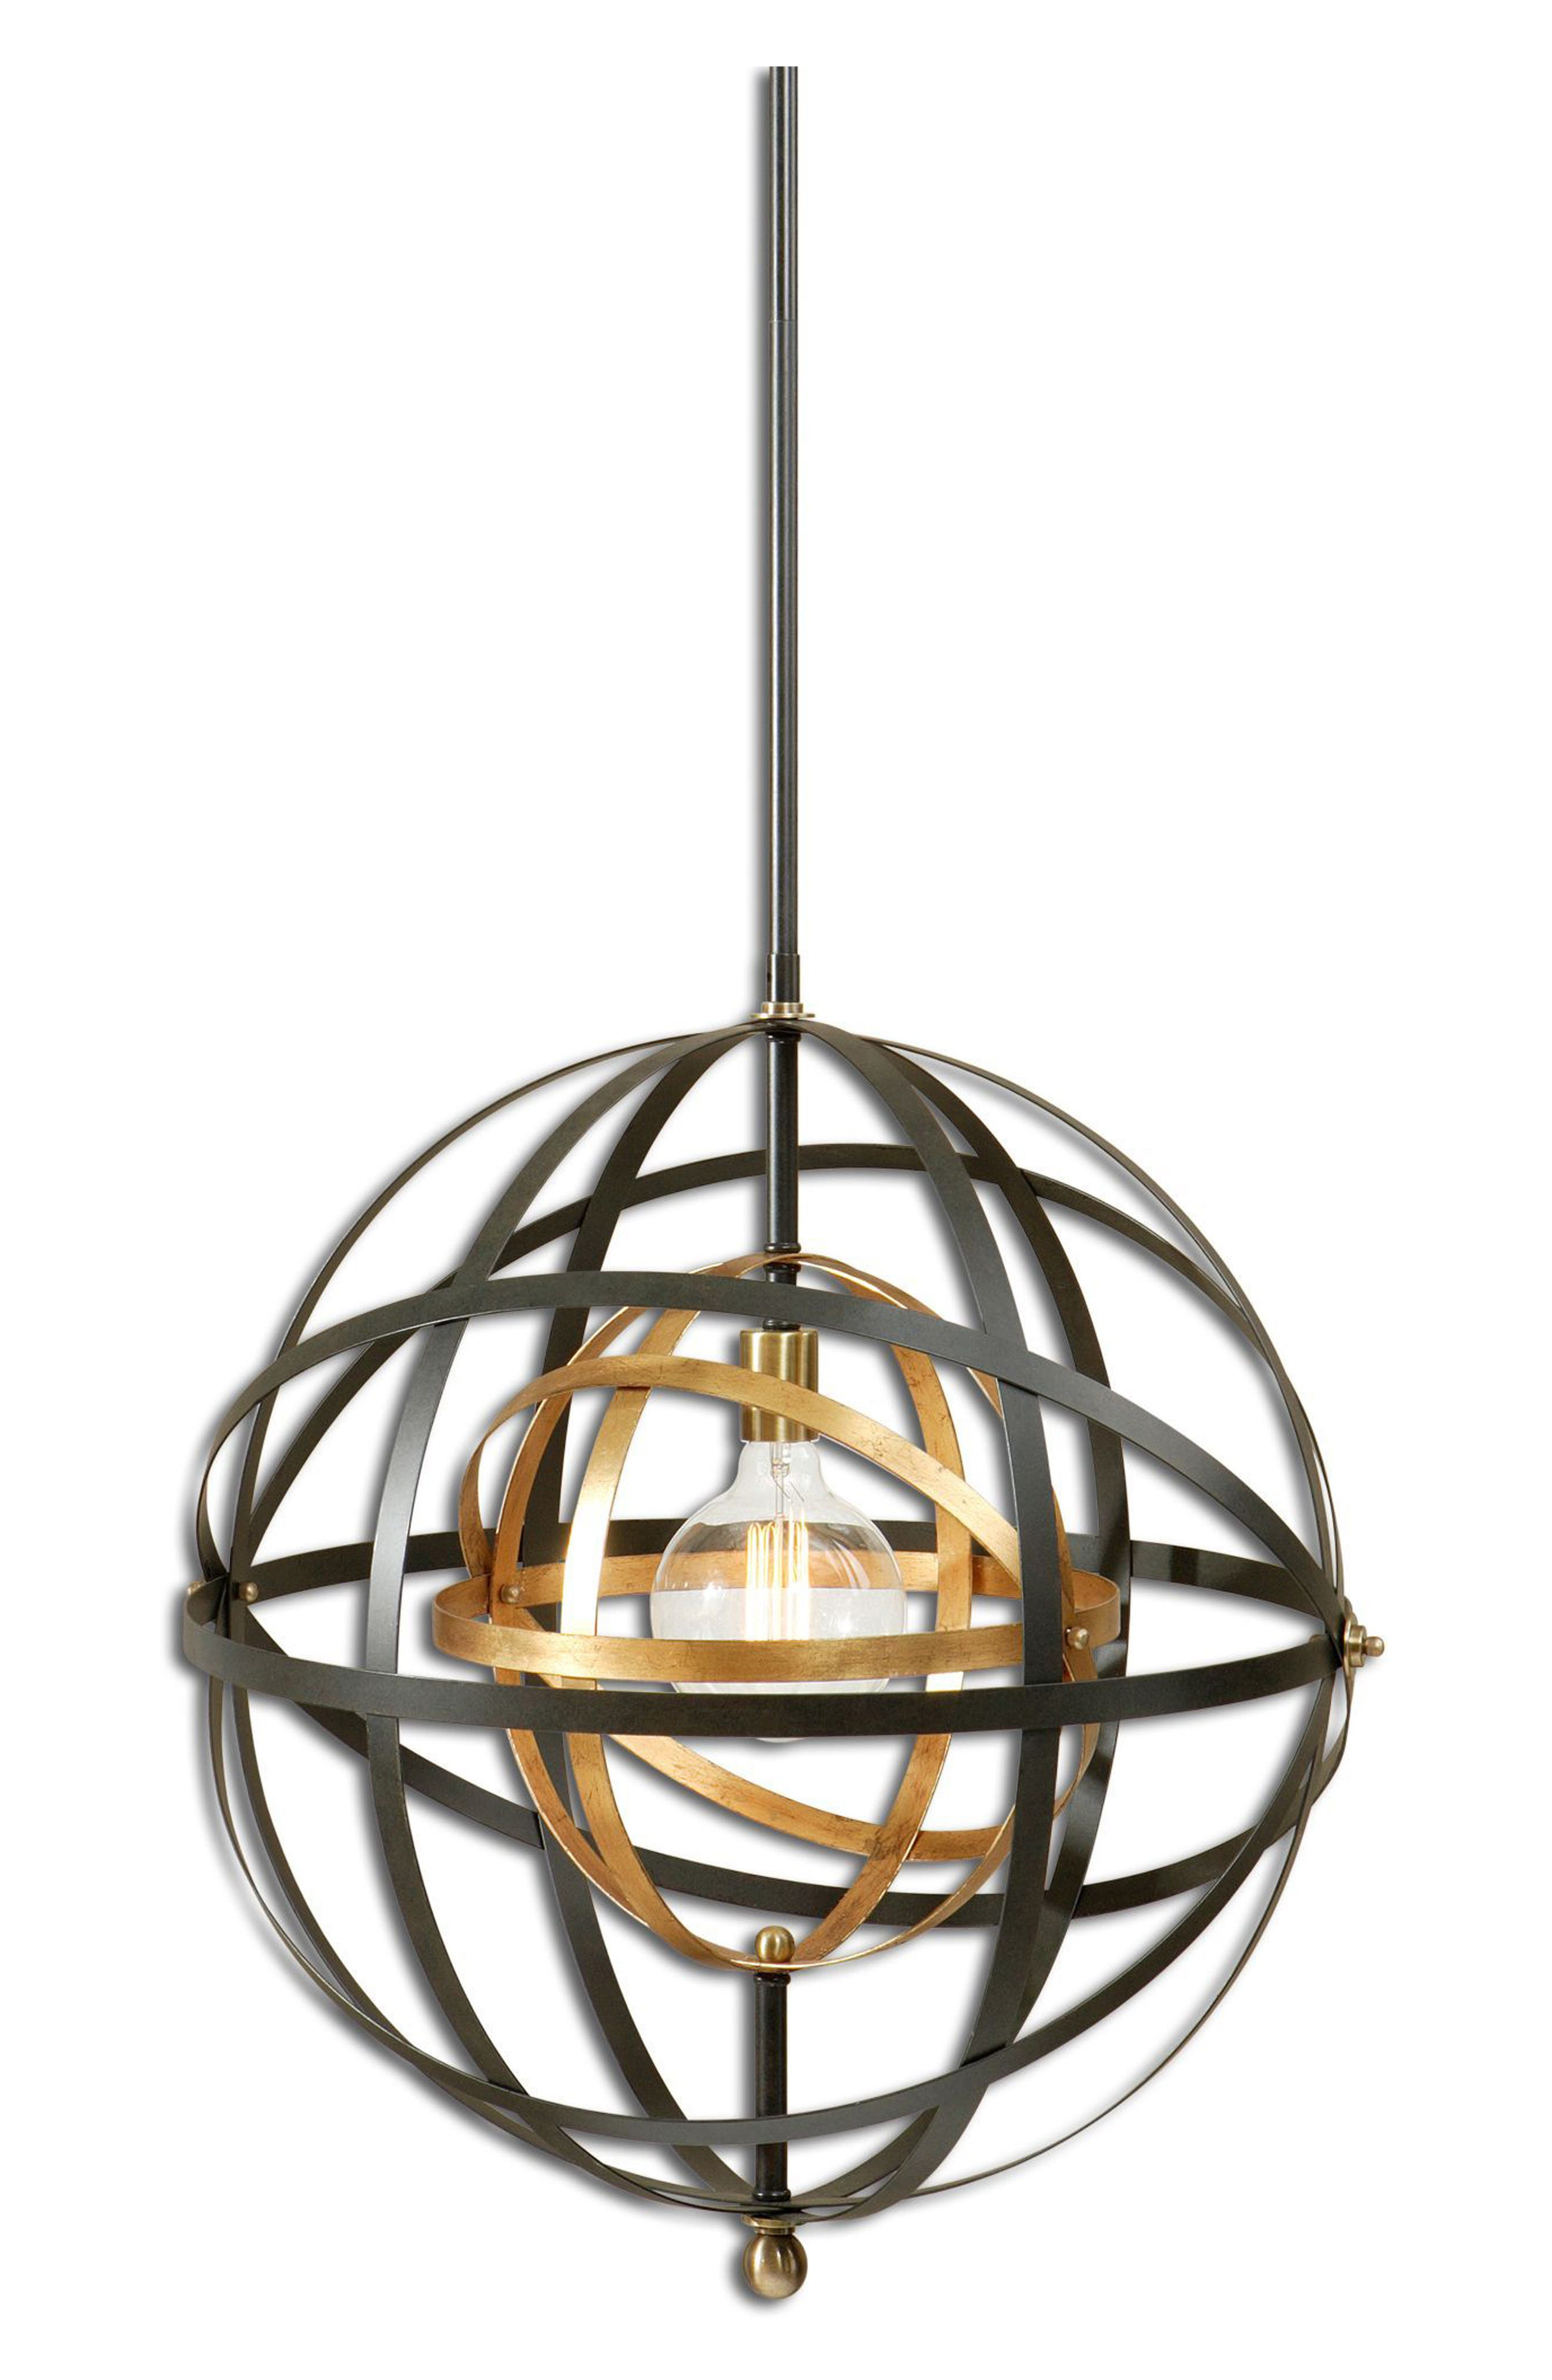 Rondure Pendant Light Fixture,                         Main,                         color, Metallic Rust/ Copper